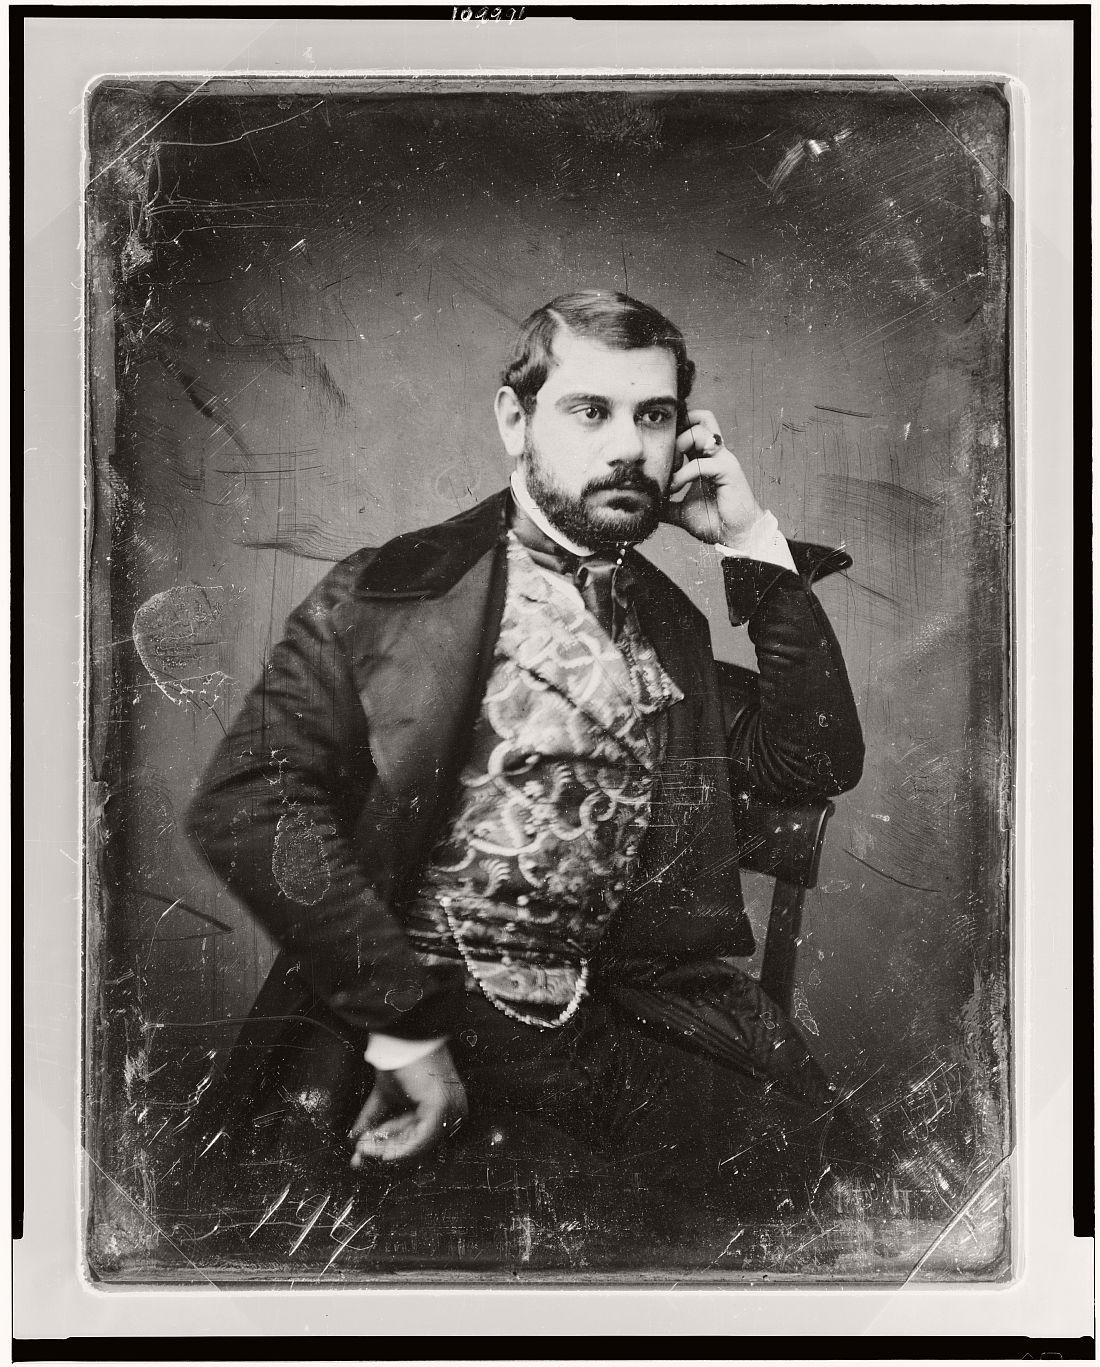 vintage-daguerreotype-portraits-from-xix-century-1844-1860-41